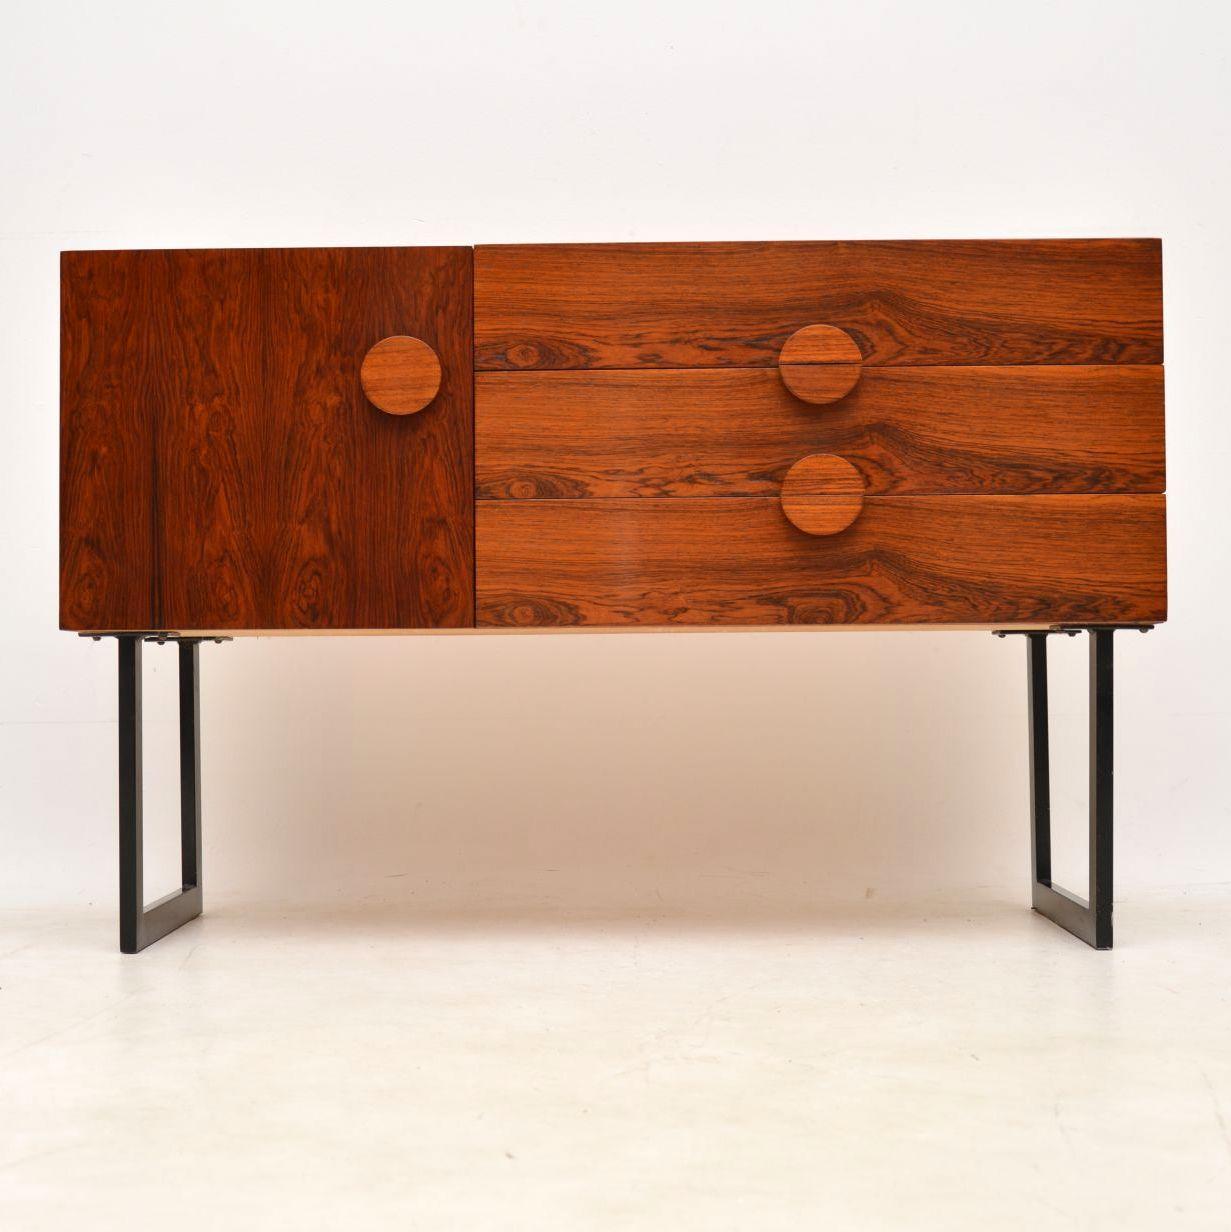 danish_rosewood_retro_vintage_sideboard_table_2